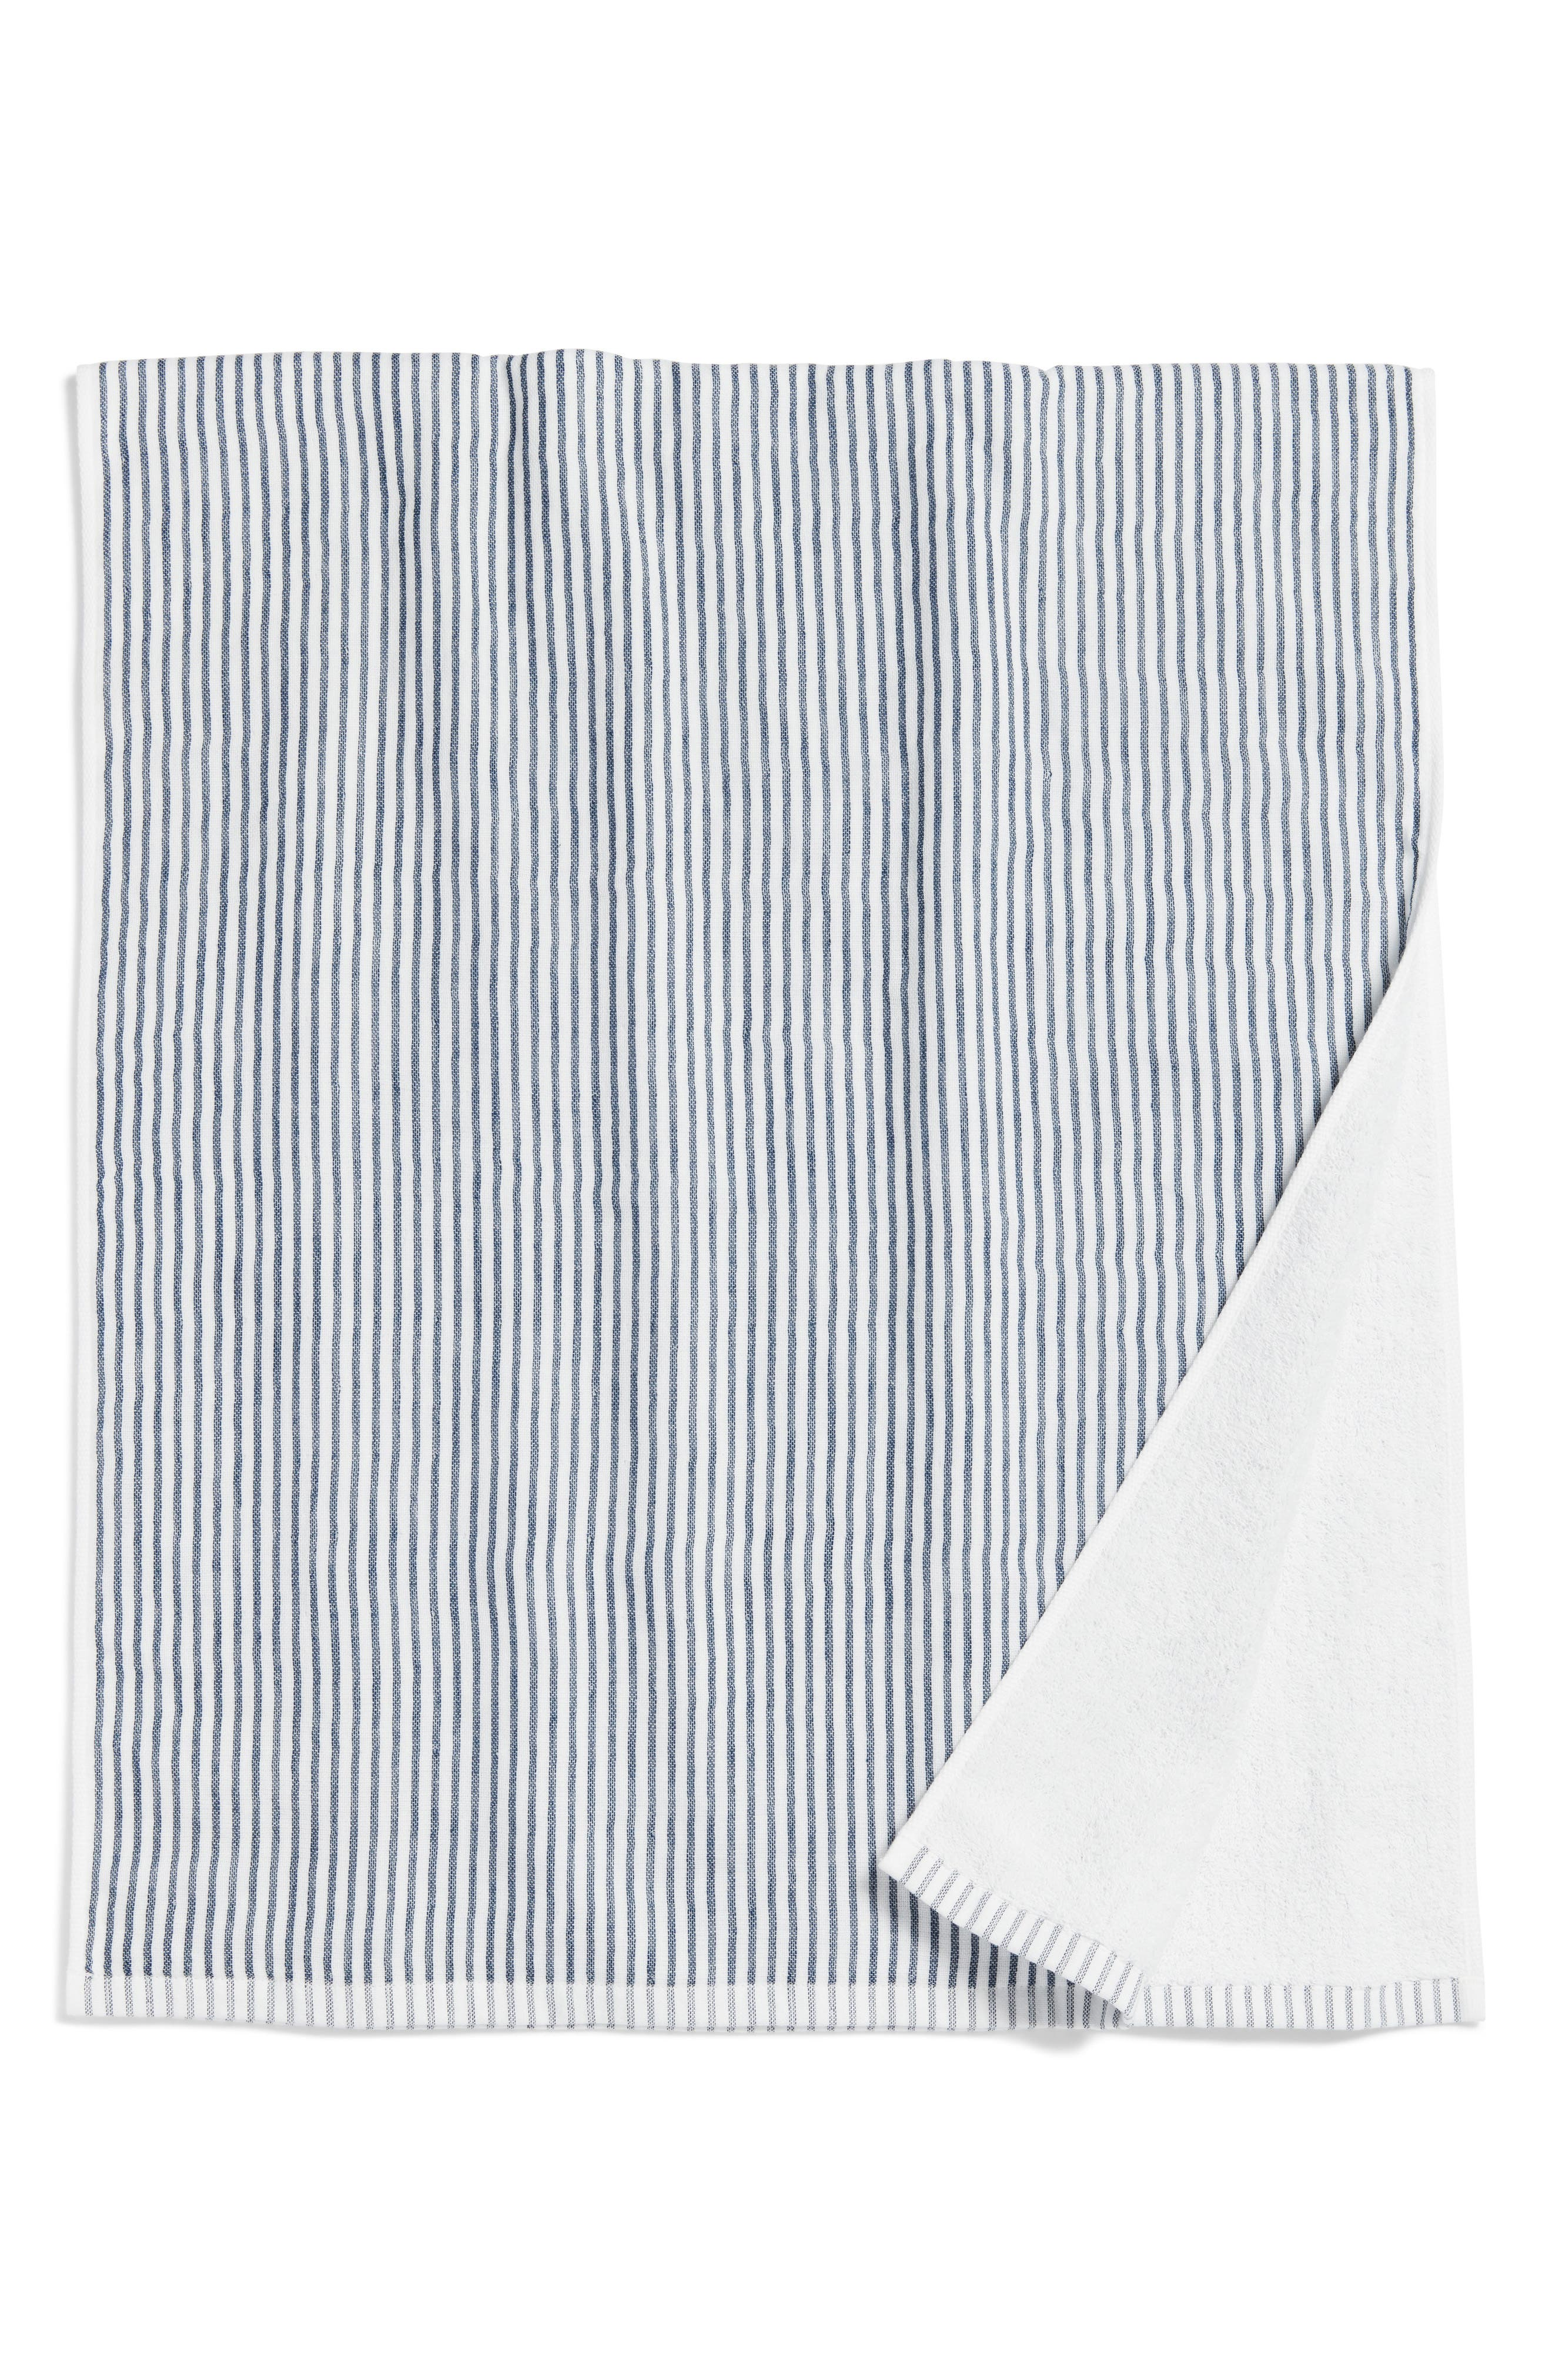 Morihata Shirt Stripe Compact Bath Towel Size One Size  None